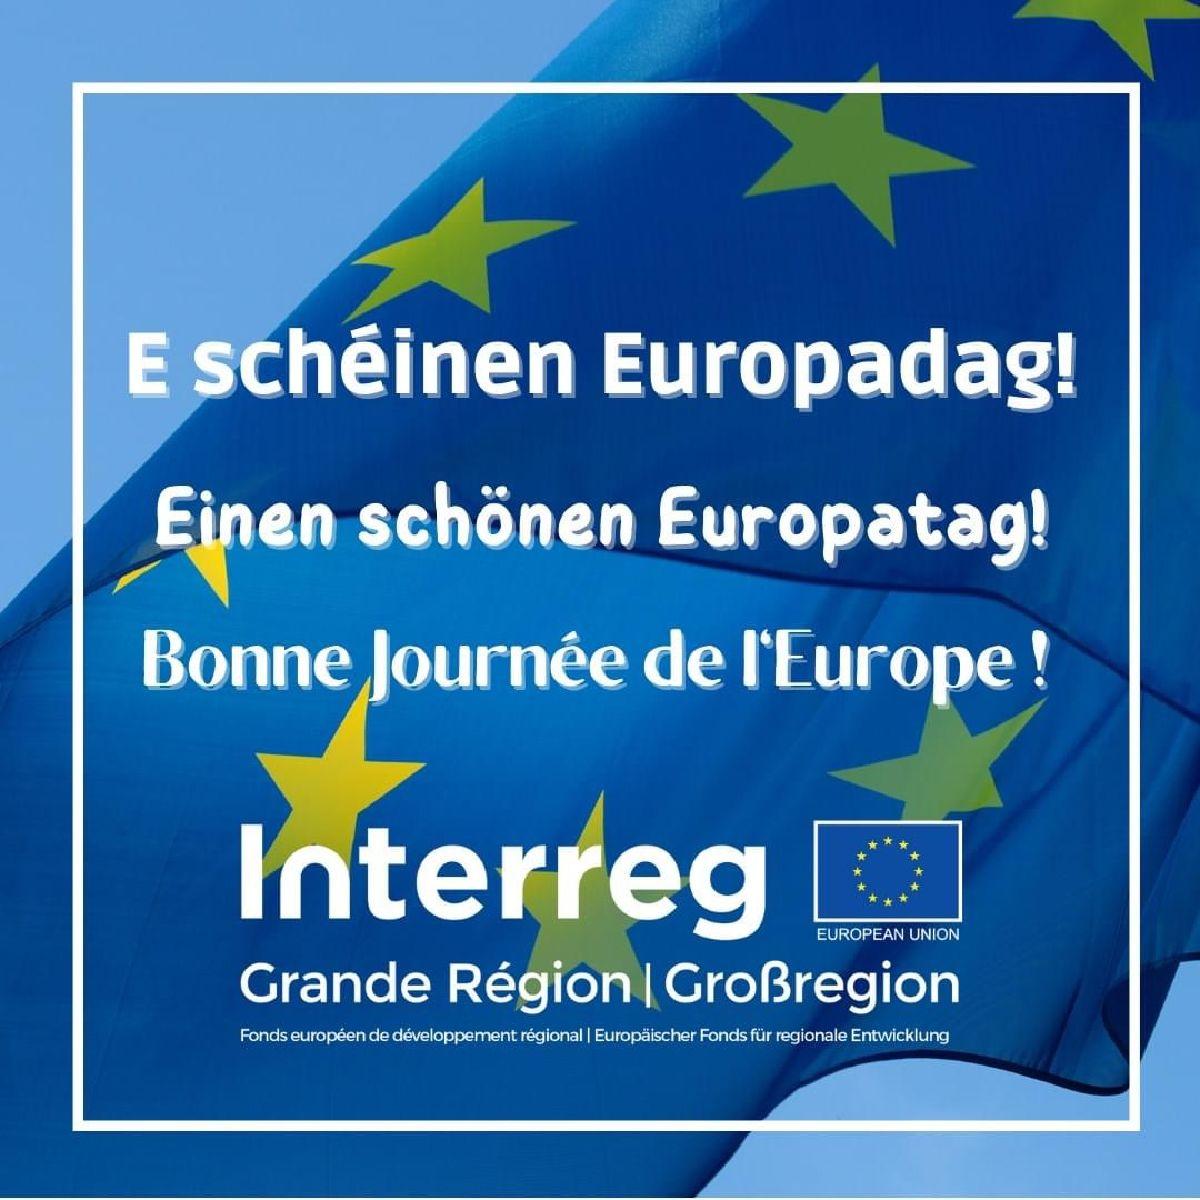 Happy Europe Day - 09.05.2021